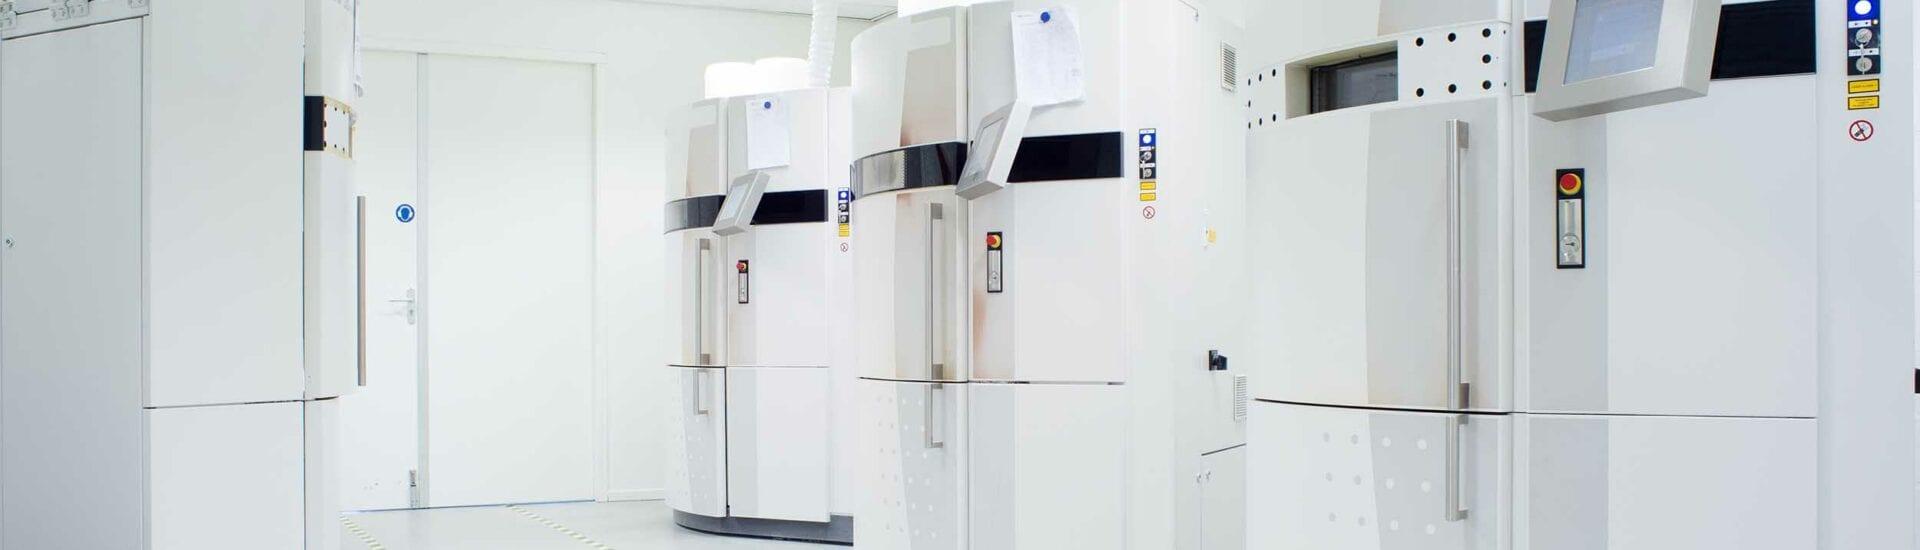 Oceanz 3D Printers